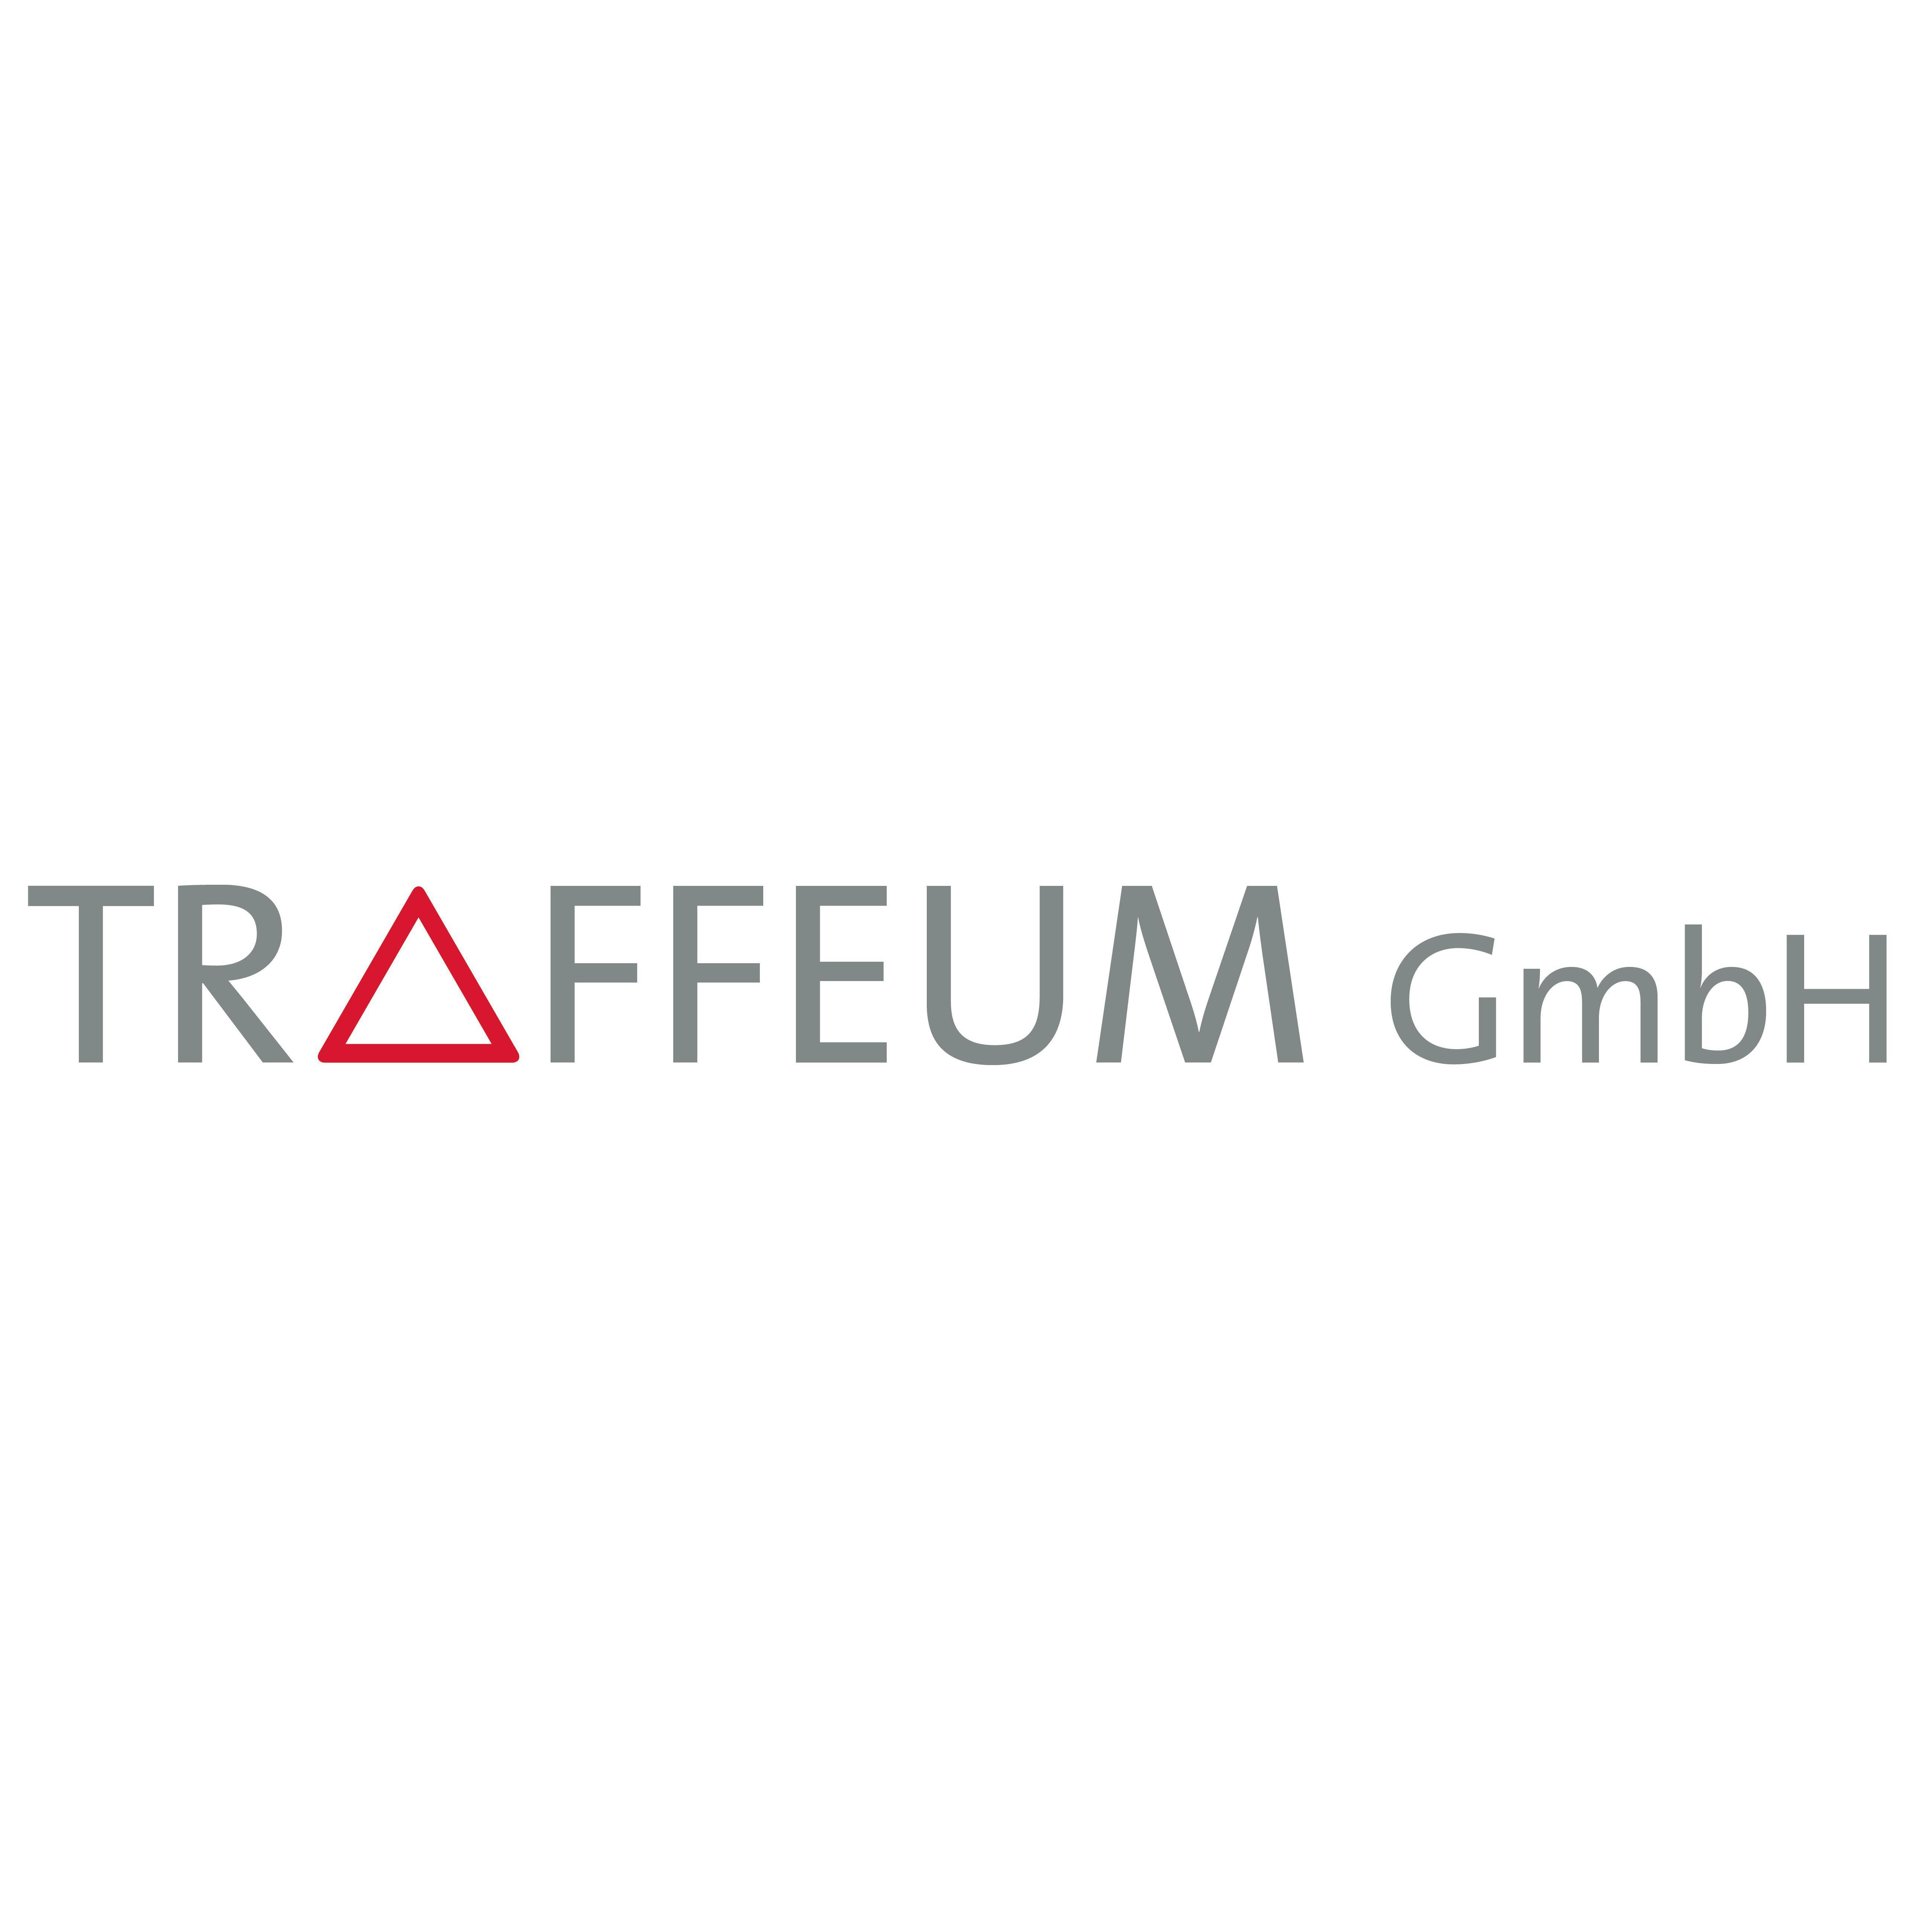 TRAFFEUM GmbH